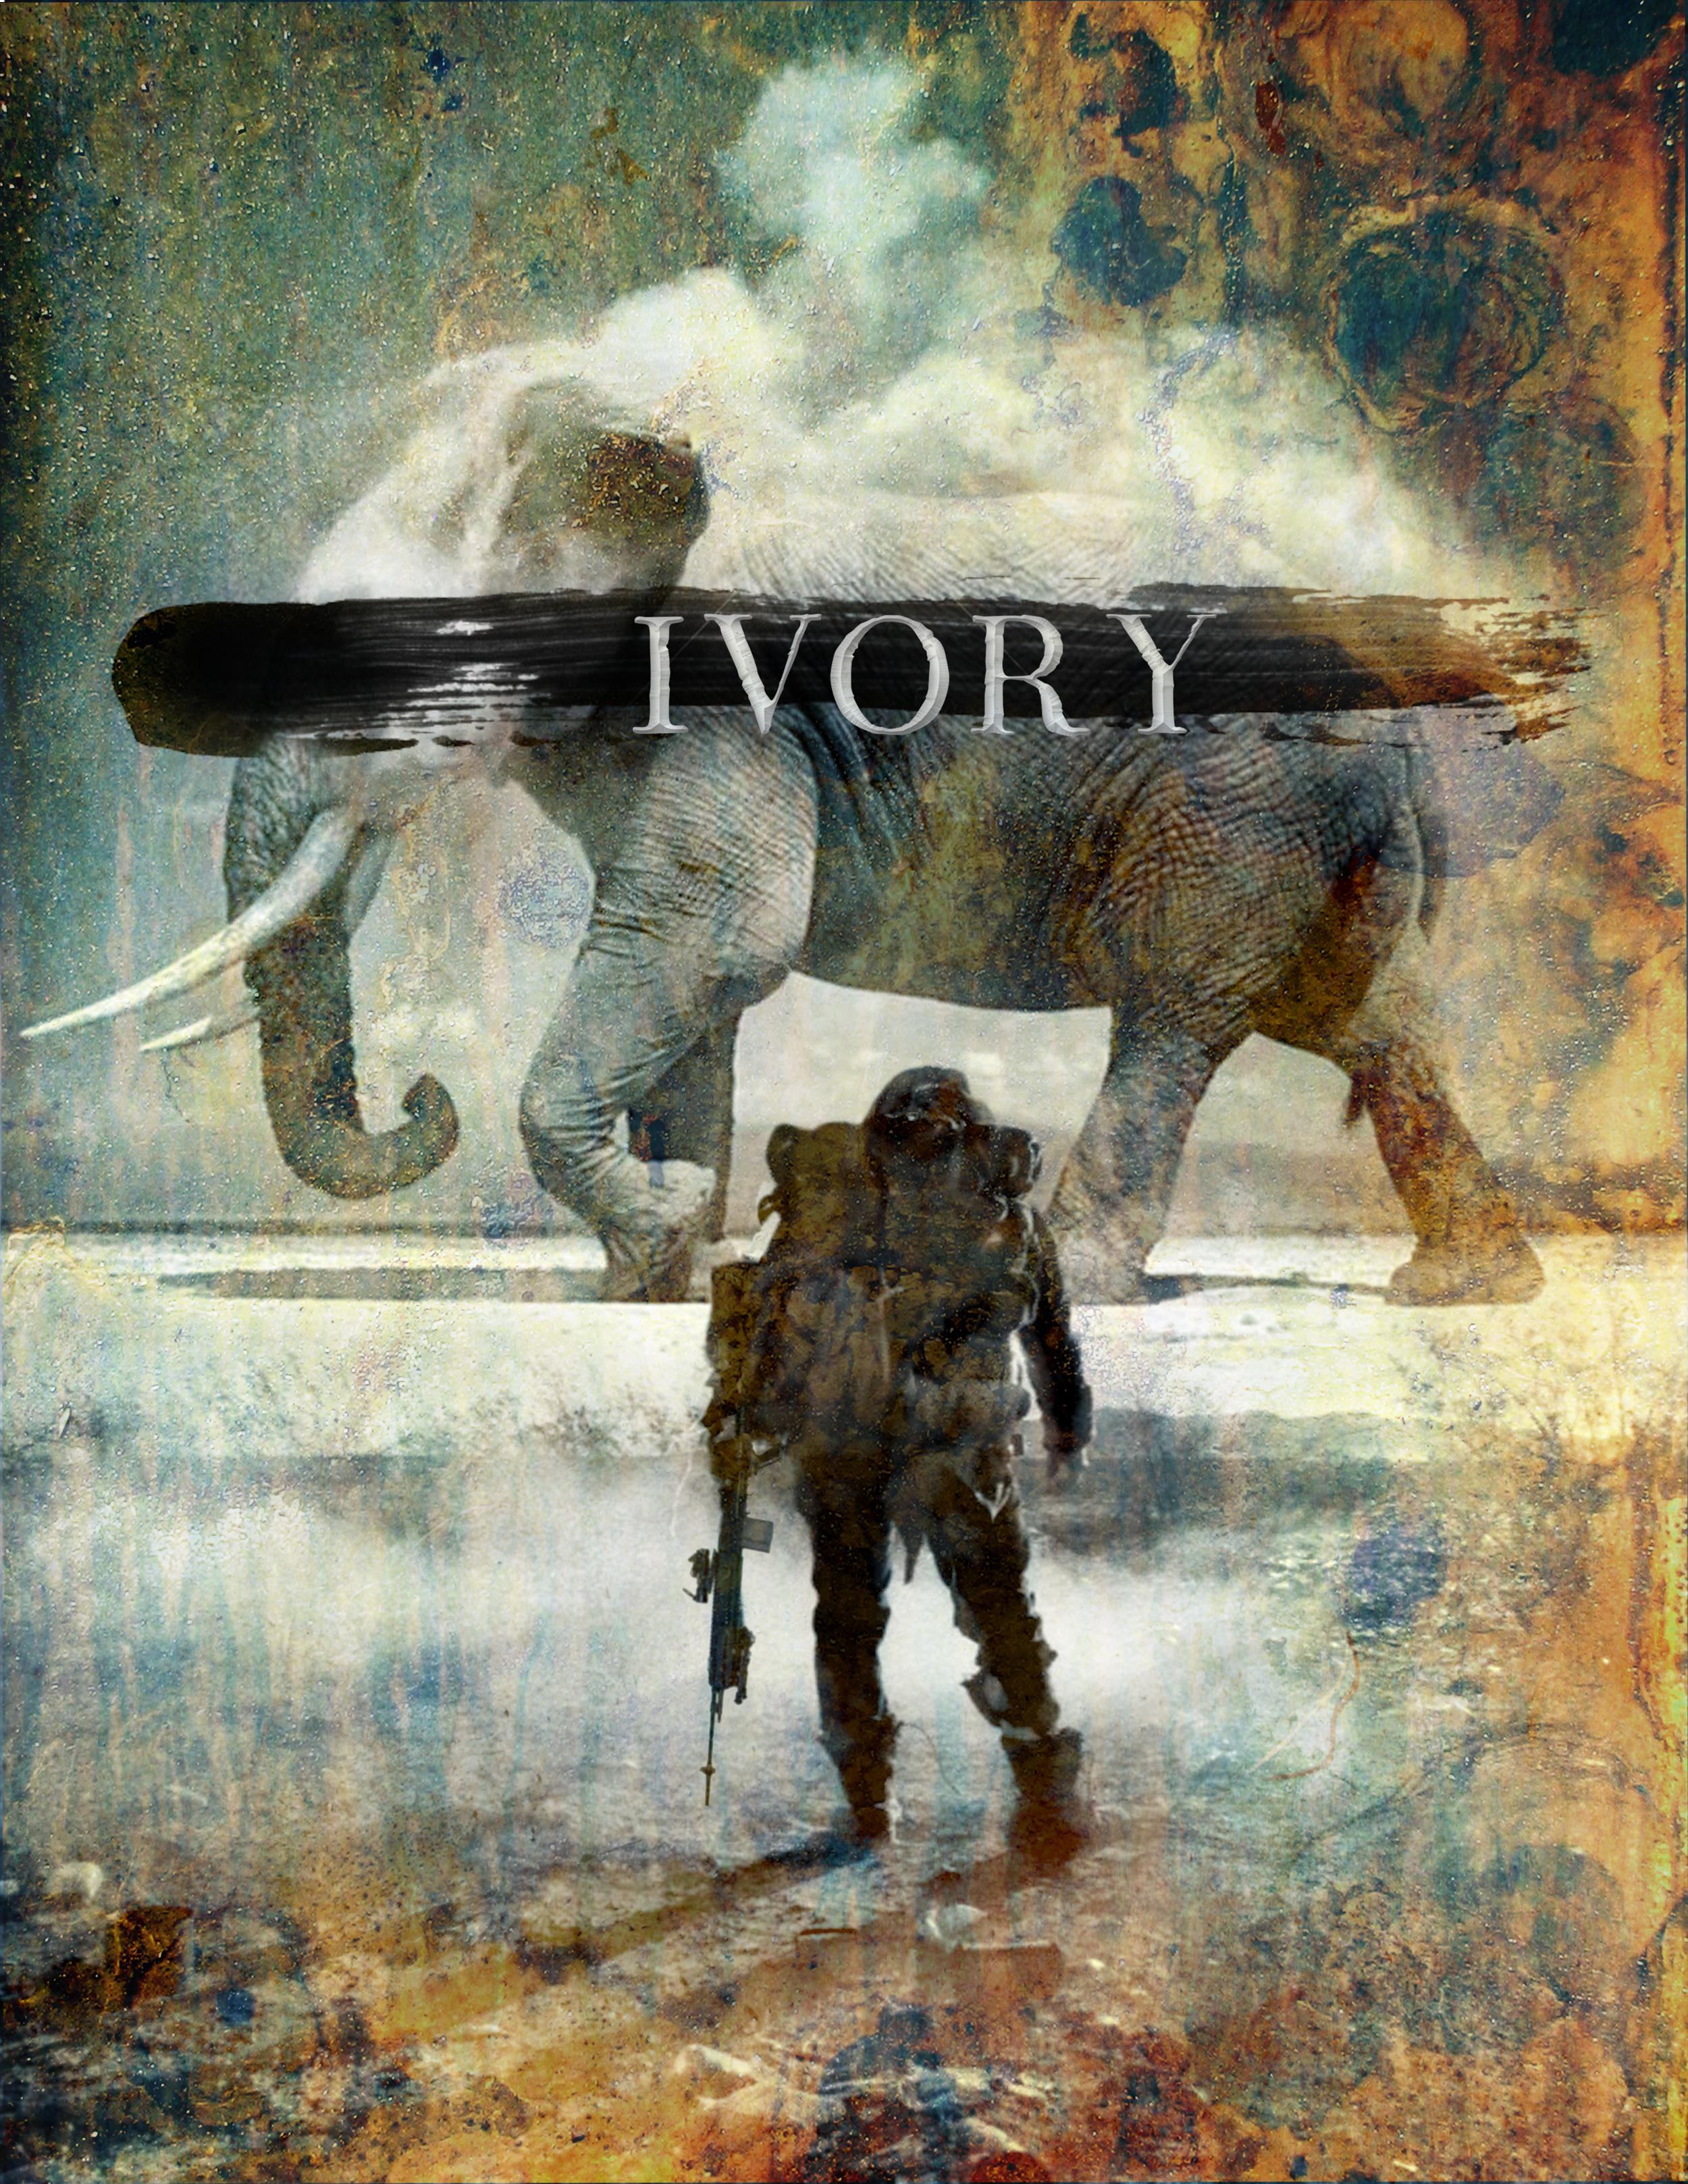 IVORY title poster copy.jpg